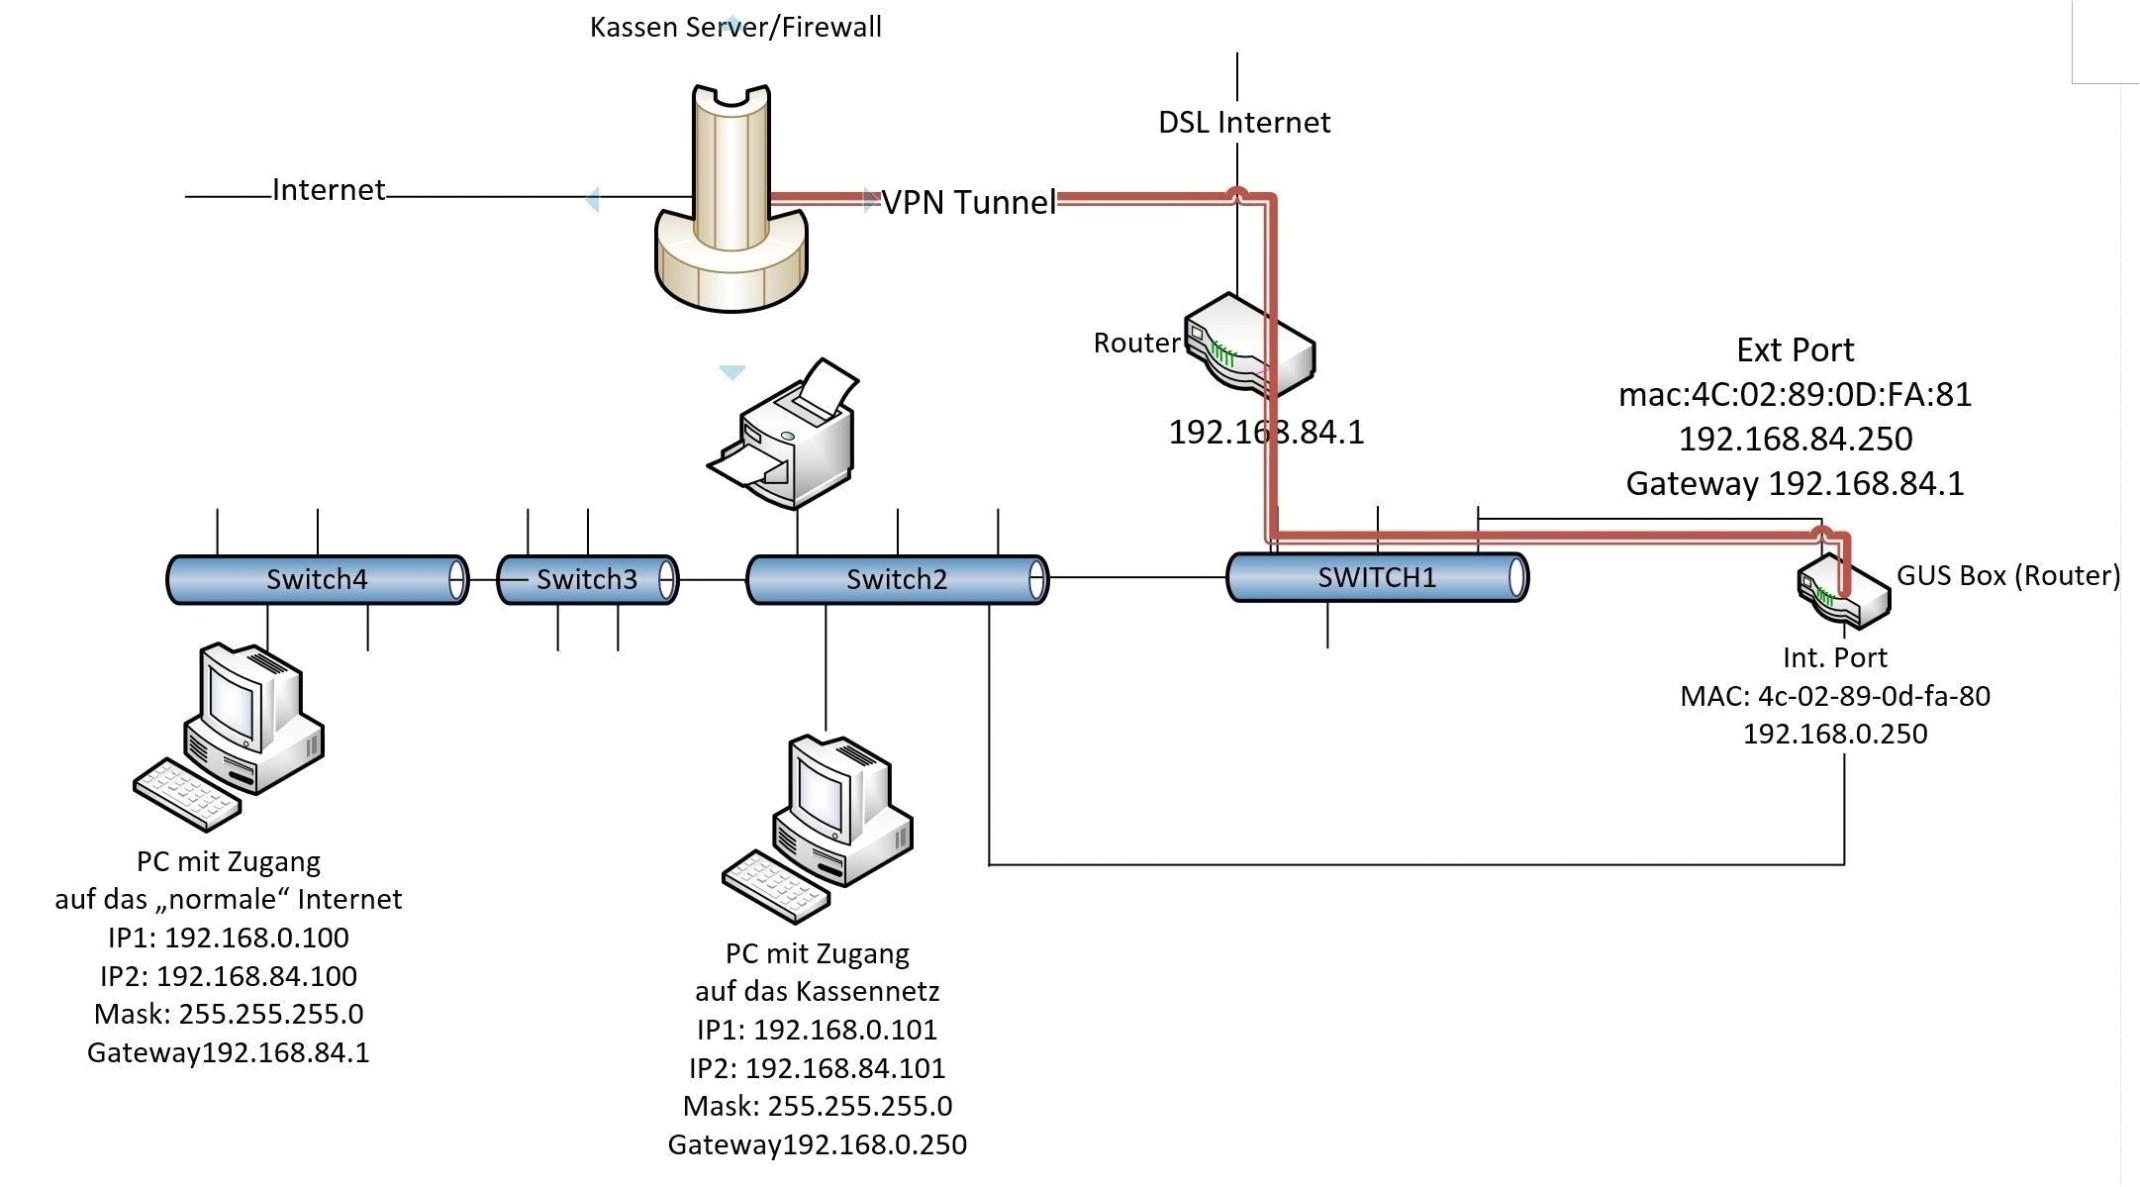 Network Wiring Diagrams Network Wiring Diagram Floor Wiring Diagram Sample